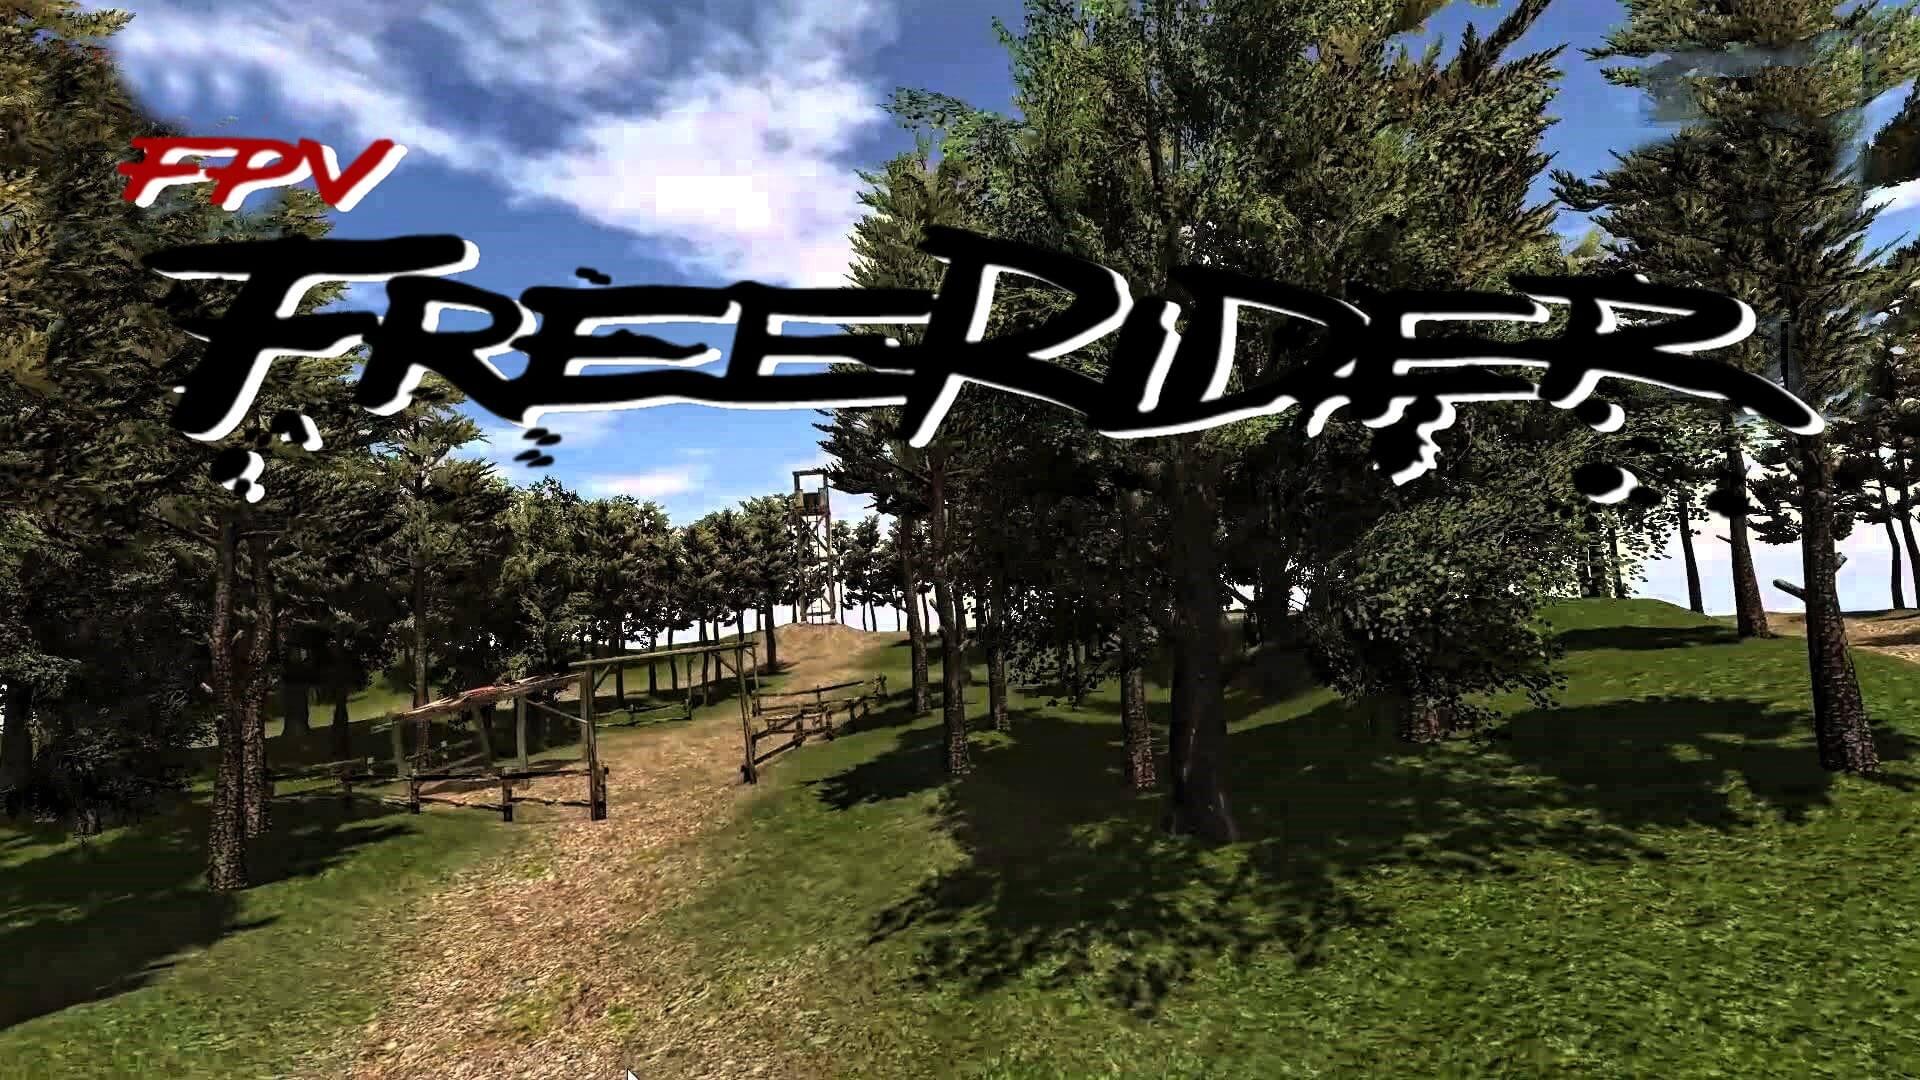 freerider-splash fpv racingdrone drohne simulator